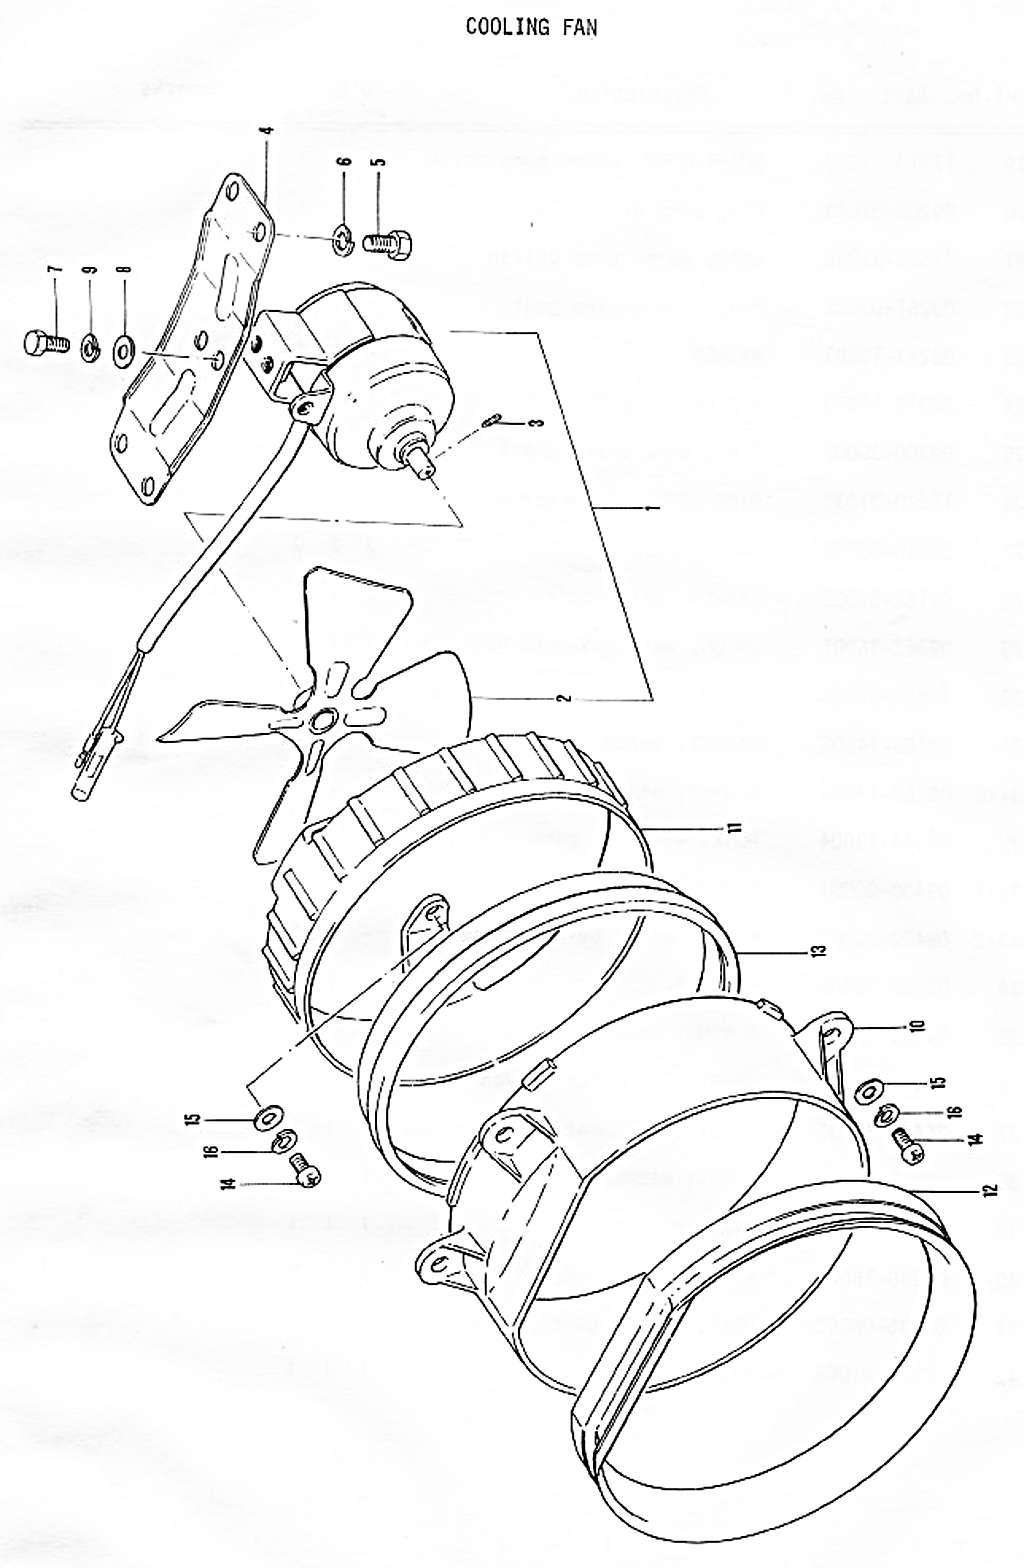 Gt750 Parts Manual Auto Engine Diagram Suzuki